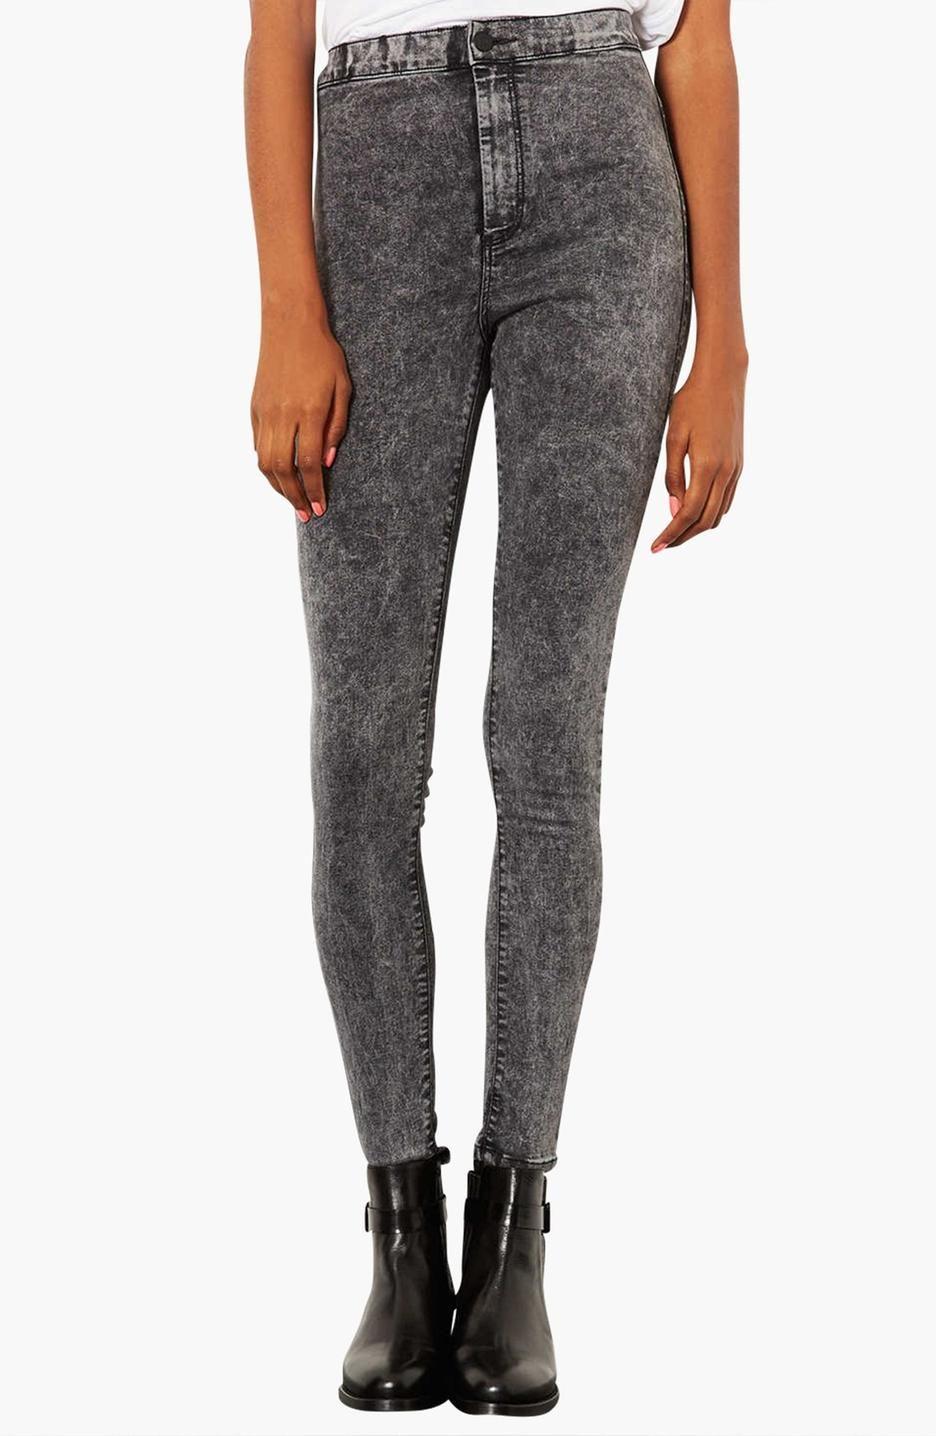 High waisted black skinny jeans long